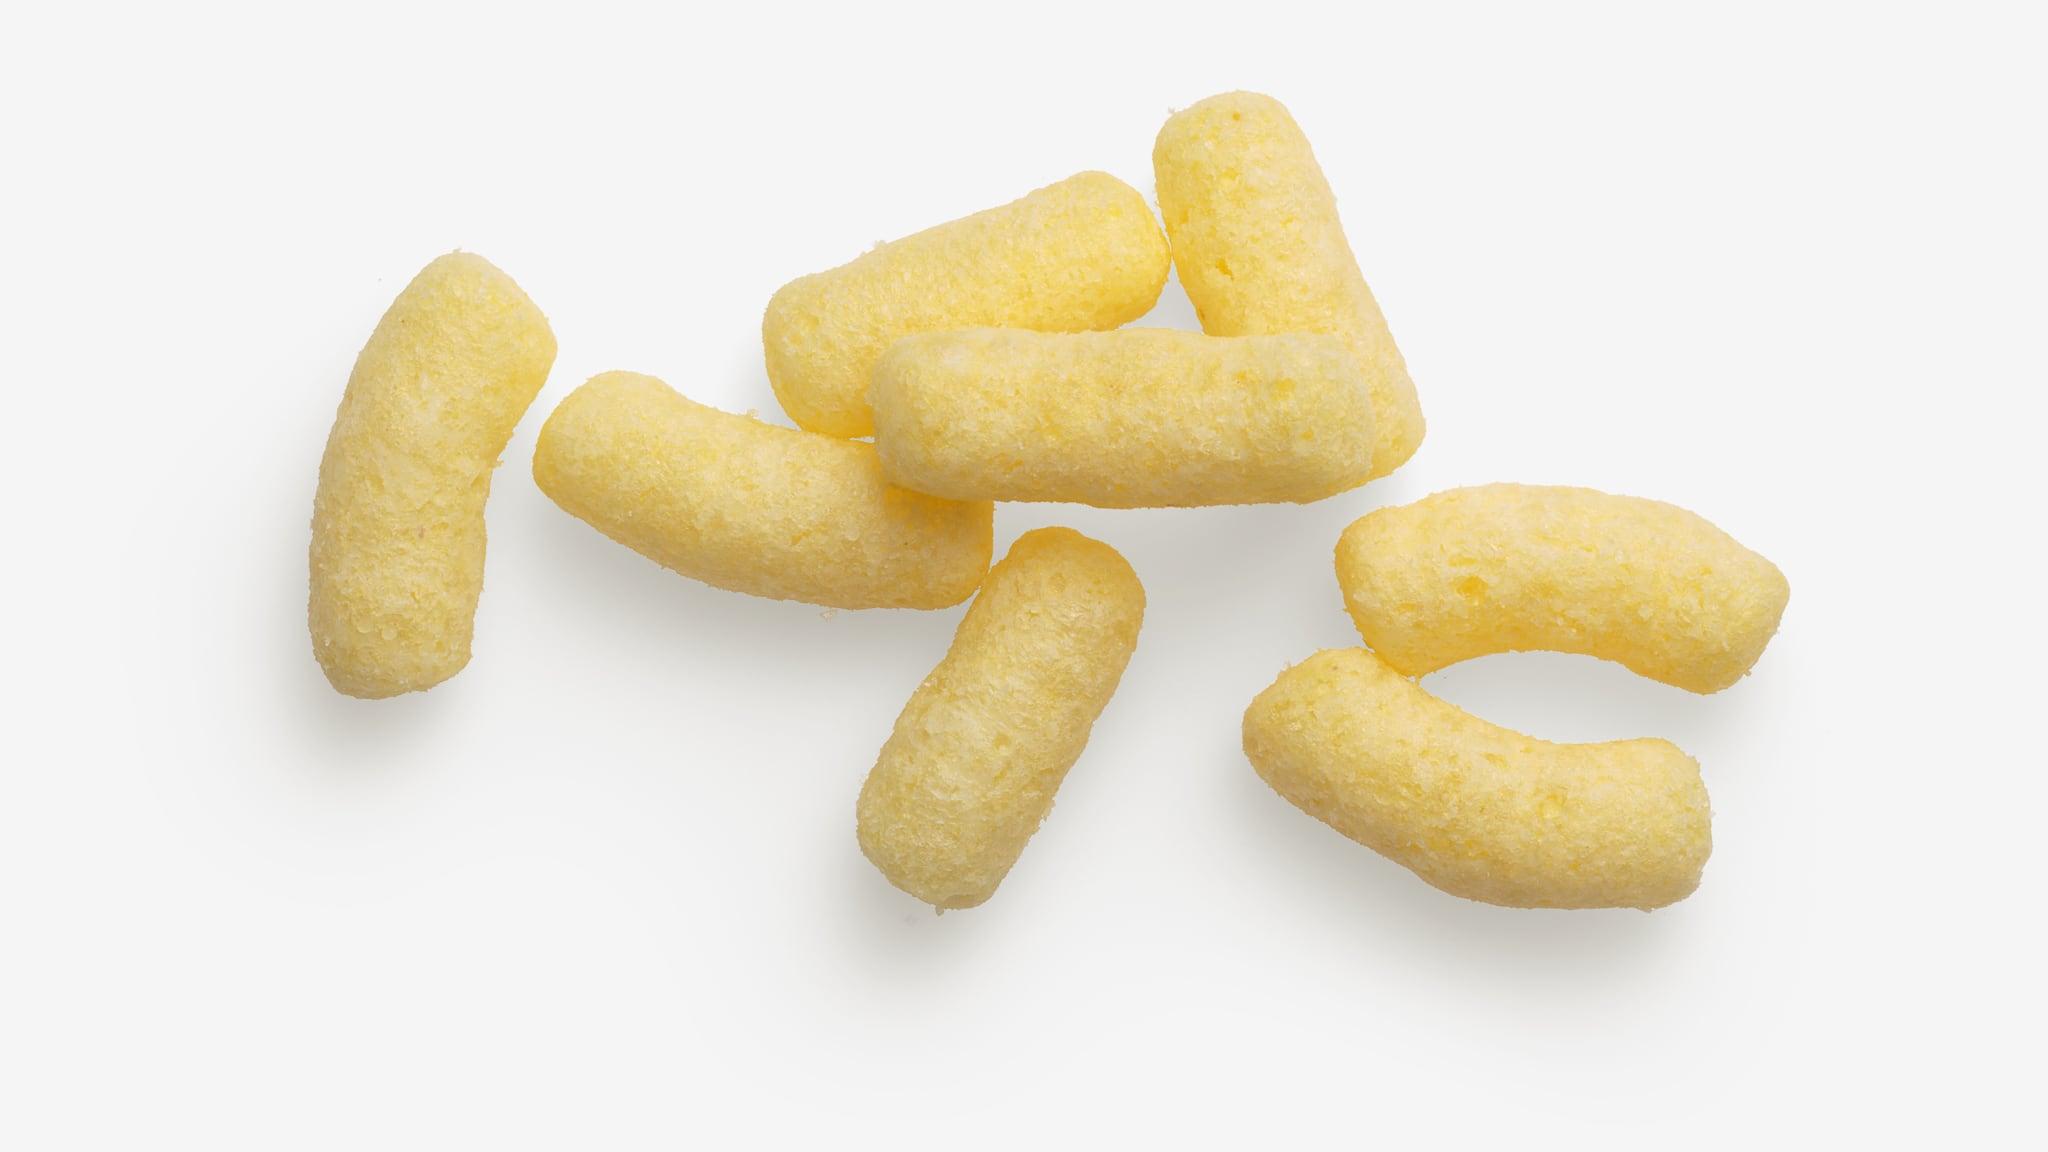 Corn sticks PSD image with transparent background